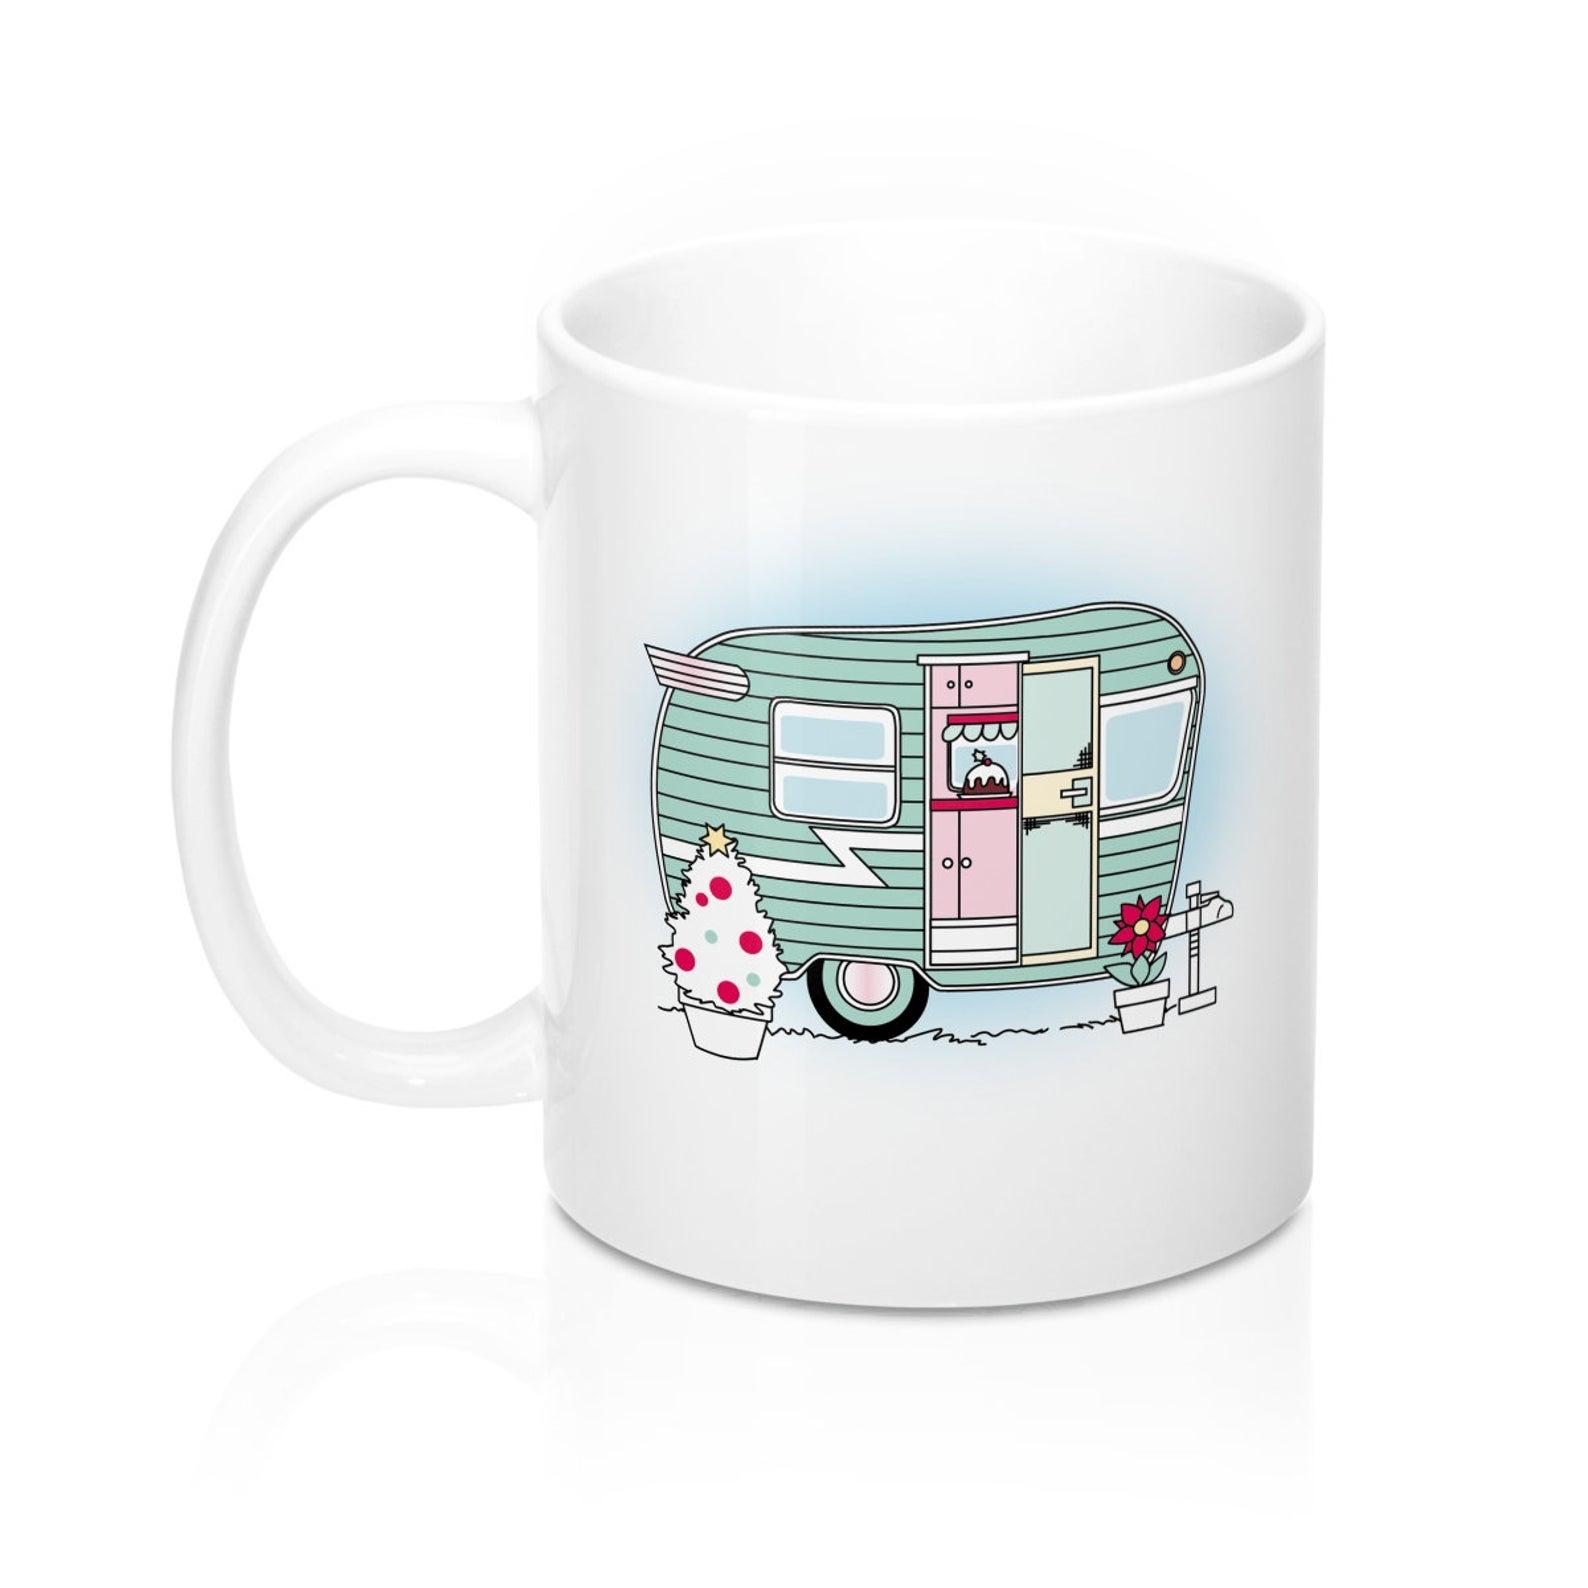 Christmas Camper Mug Christmas Mug Green Camper Vintage Camper Caravan Mug Happy Camper Mug Rv Mug Christmas Mugs Mugs Pottery Designs